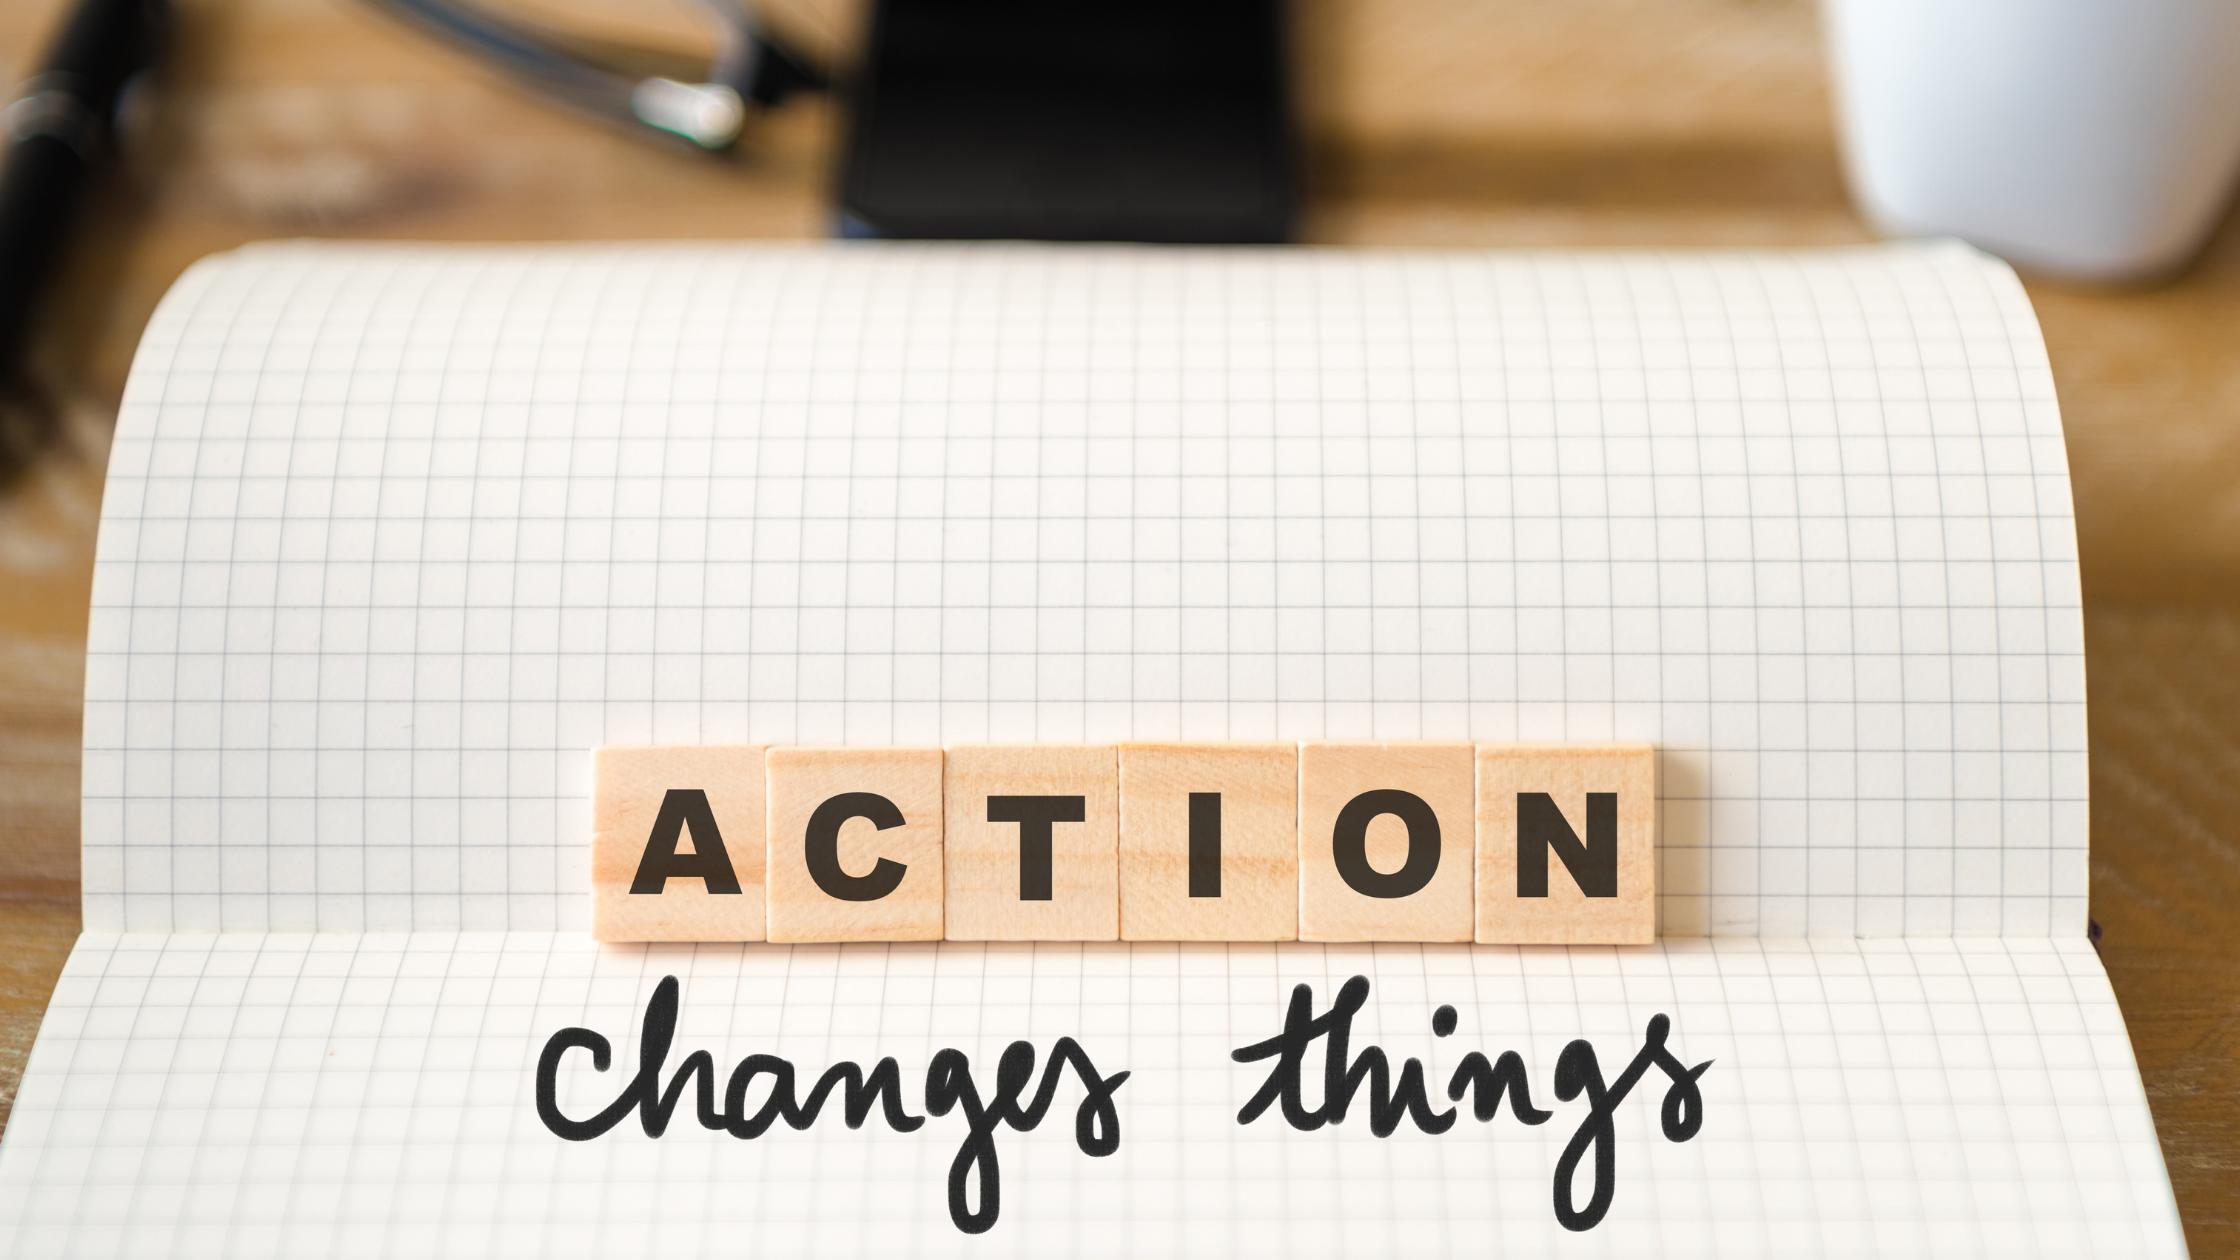 Komm schnell in die Umsetzung: Act first, think later!